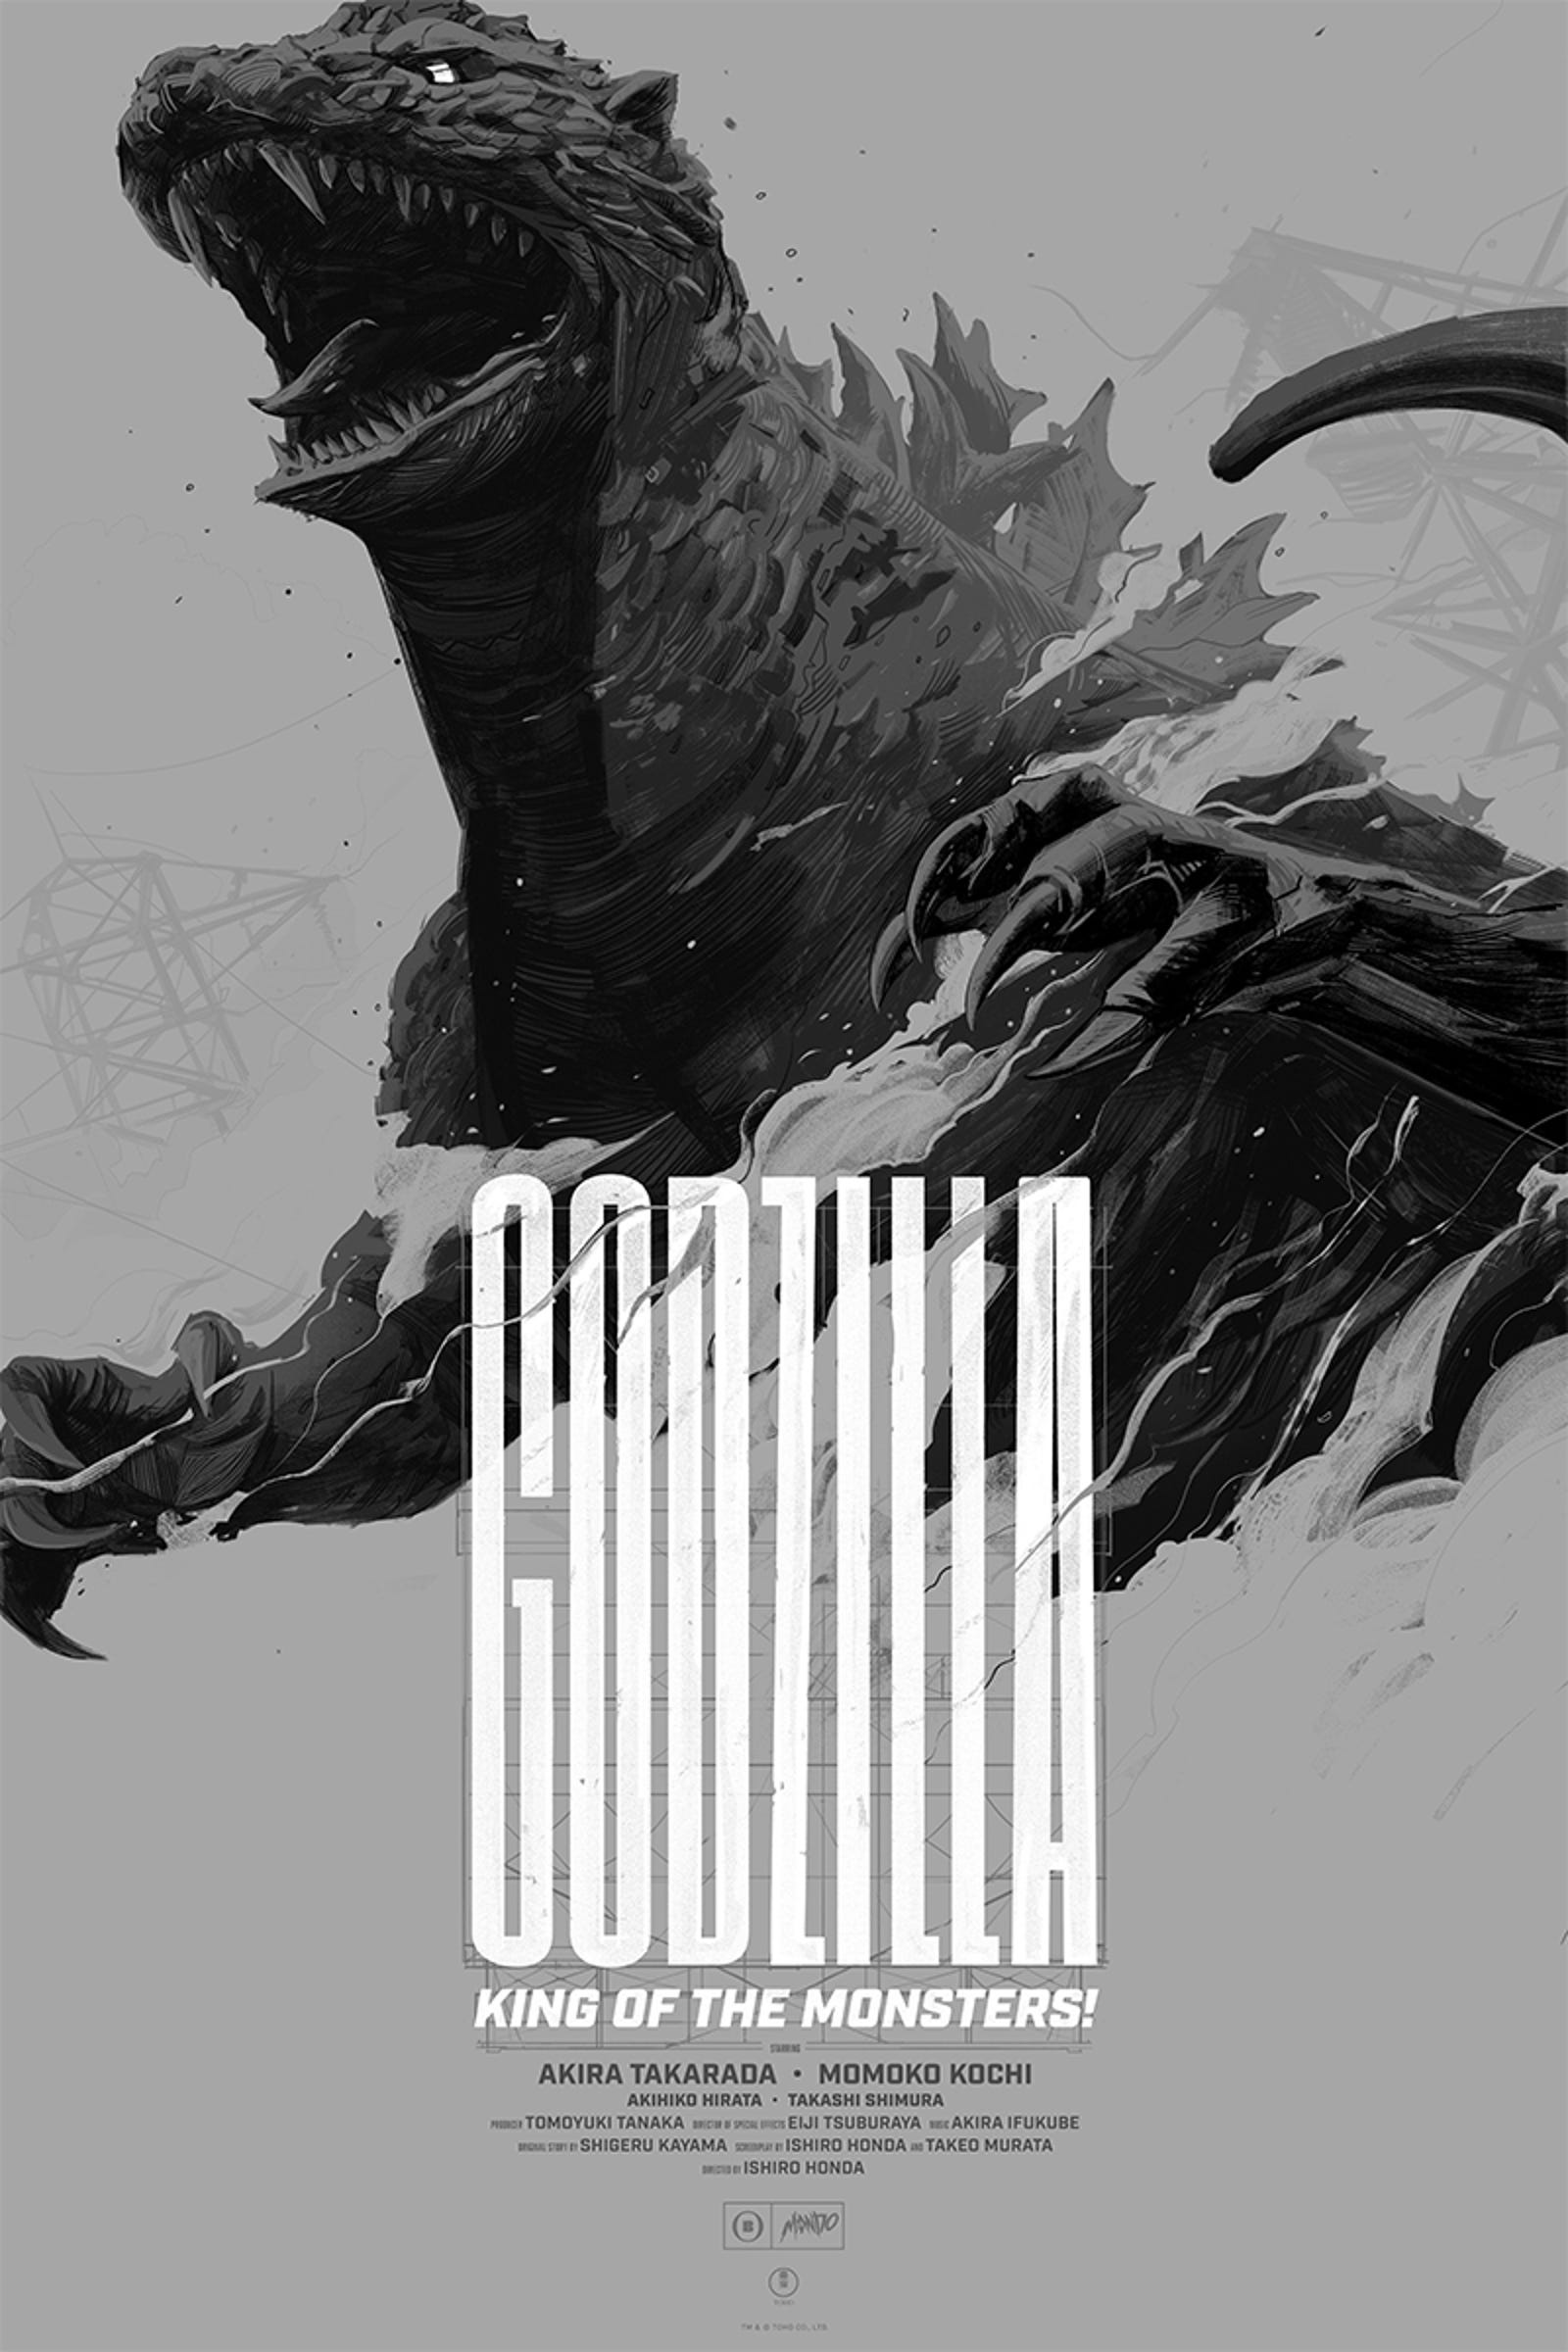 Oliver Barrett's standard King of the Monsters print...